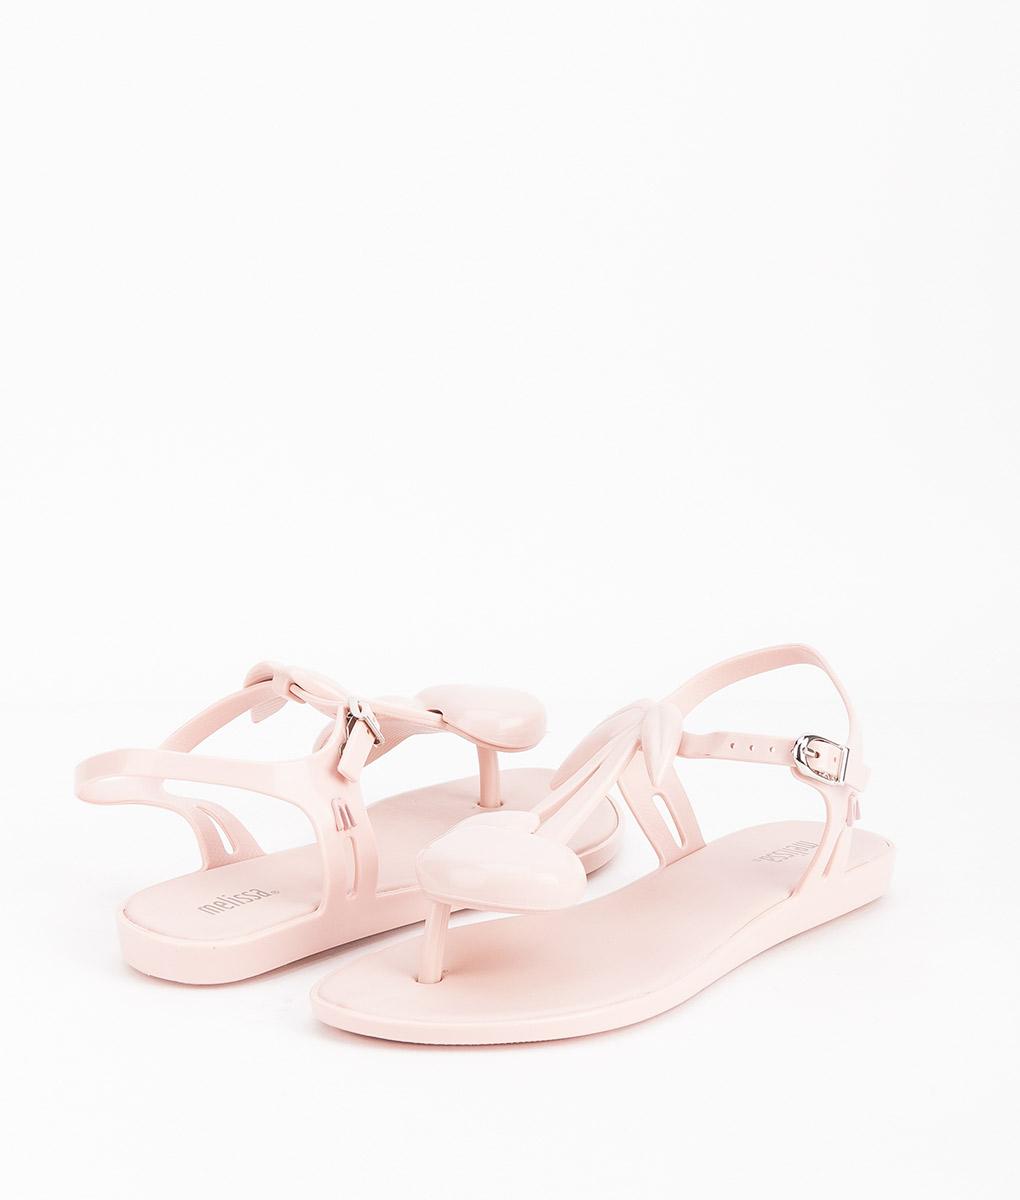 MELISSA Woman Sandals 32301 SOLAR IV, Pink 66.99 1